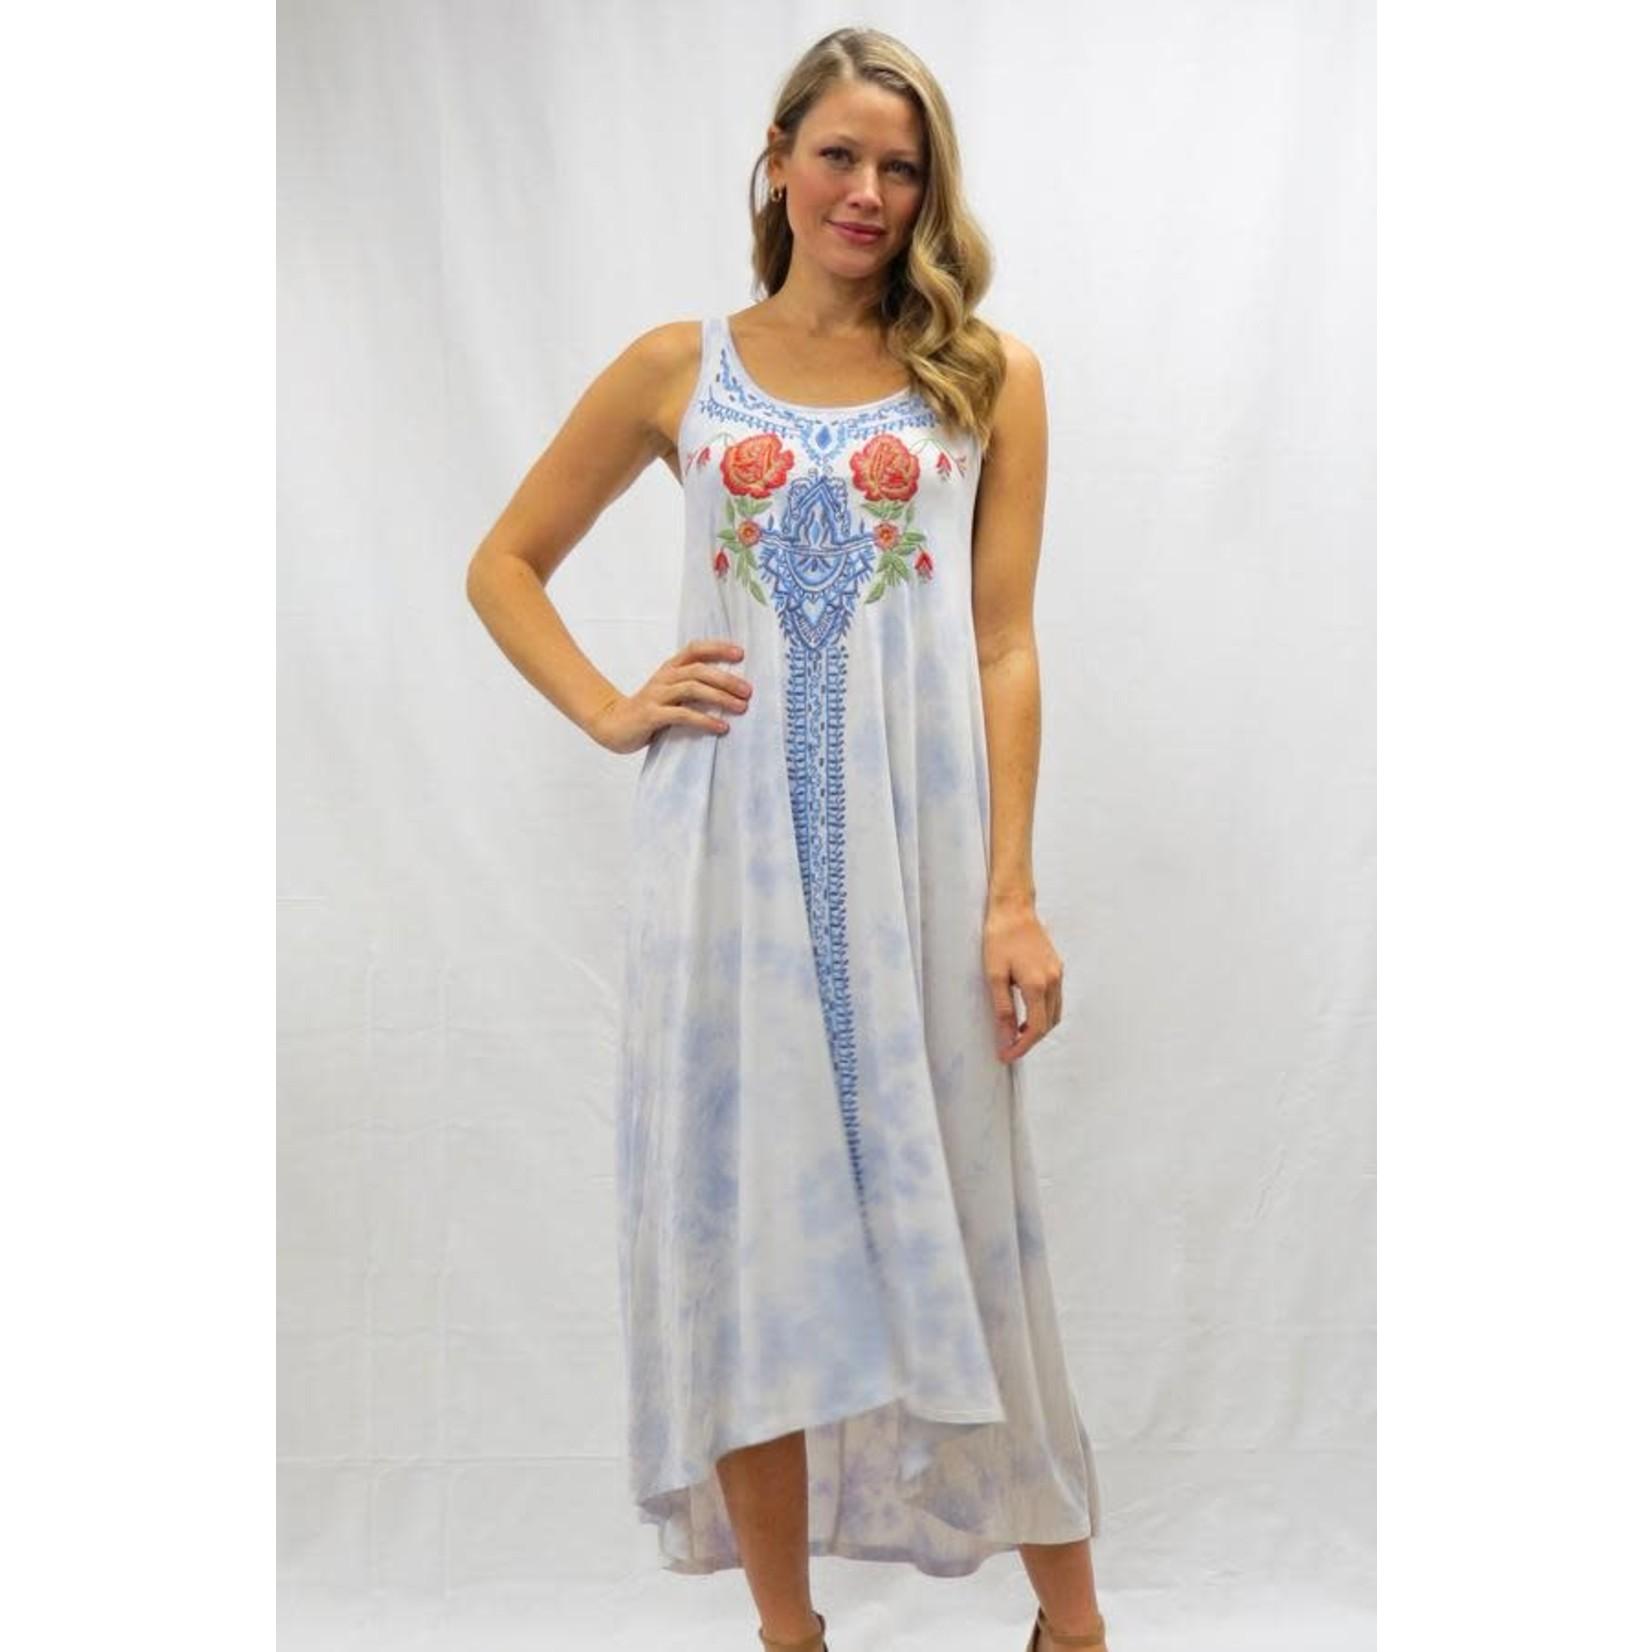 Caite Mollie Sky Blue Tye Dye Maxie w/ Embroidered Design